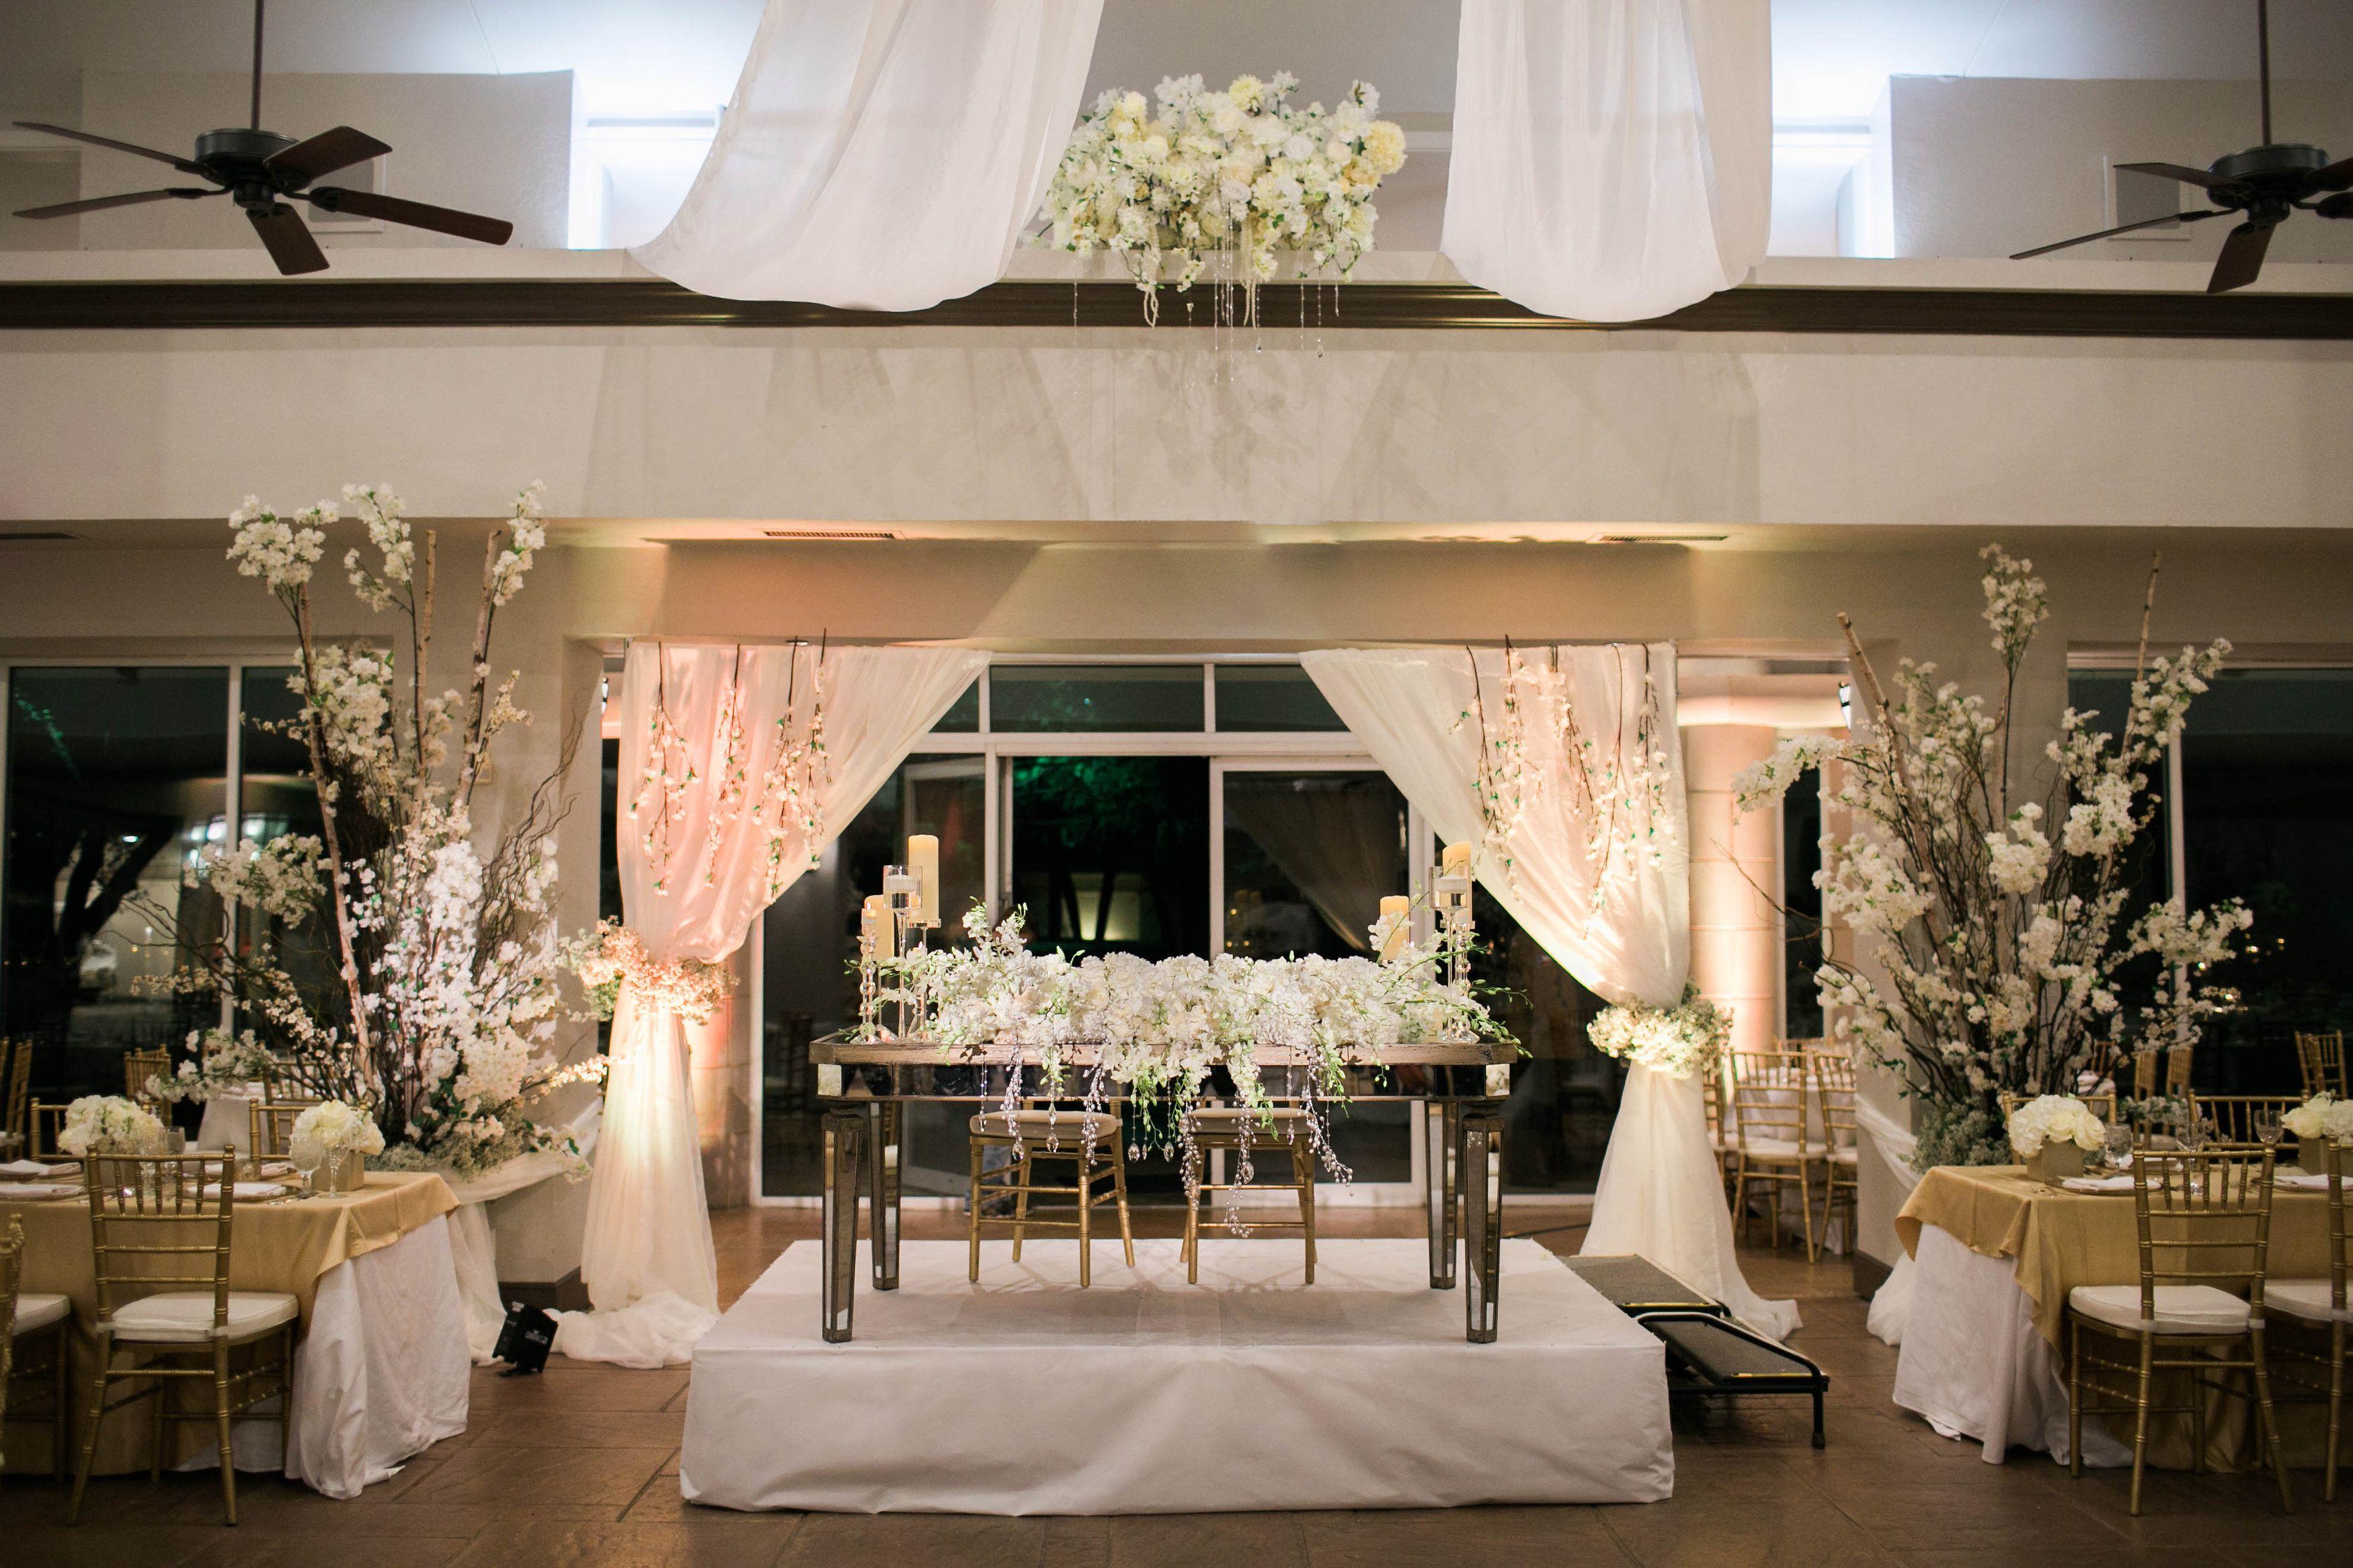 Ana + Tim November Wedding | @mkeventboutique